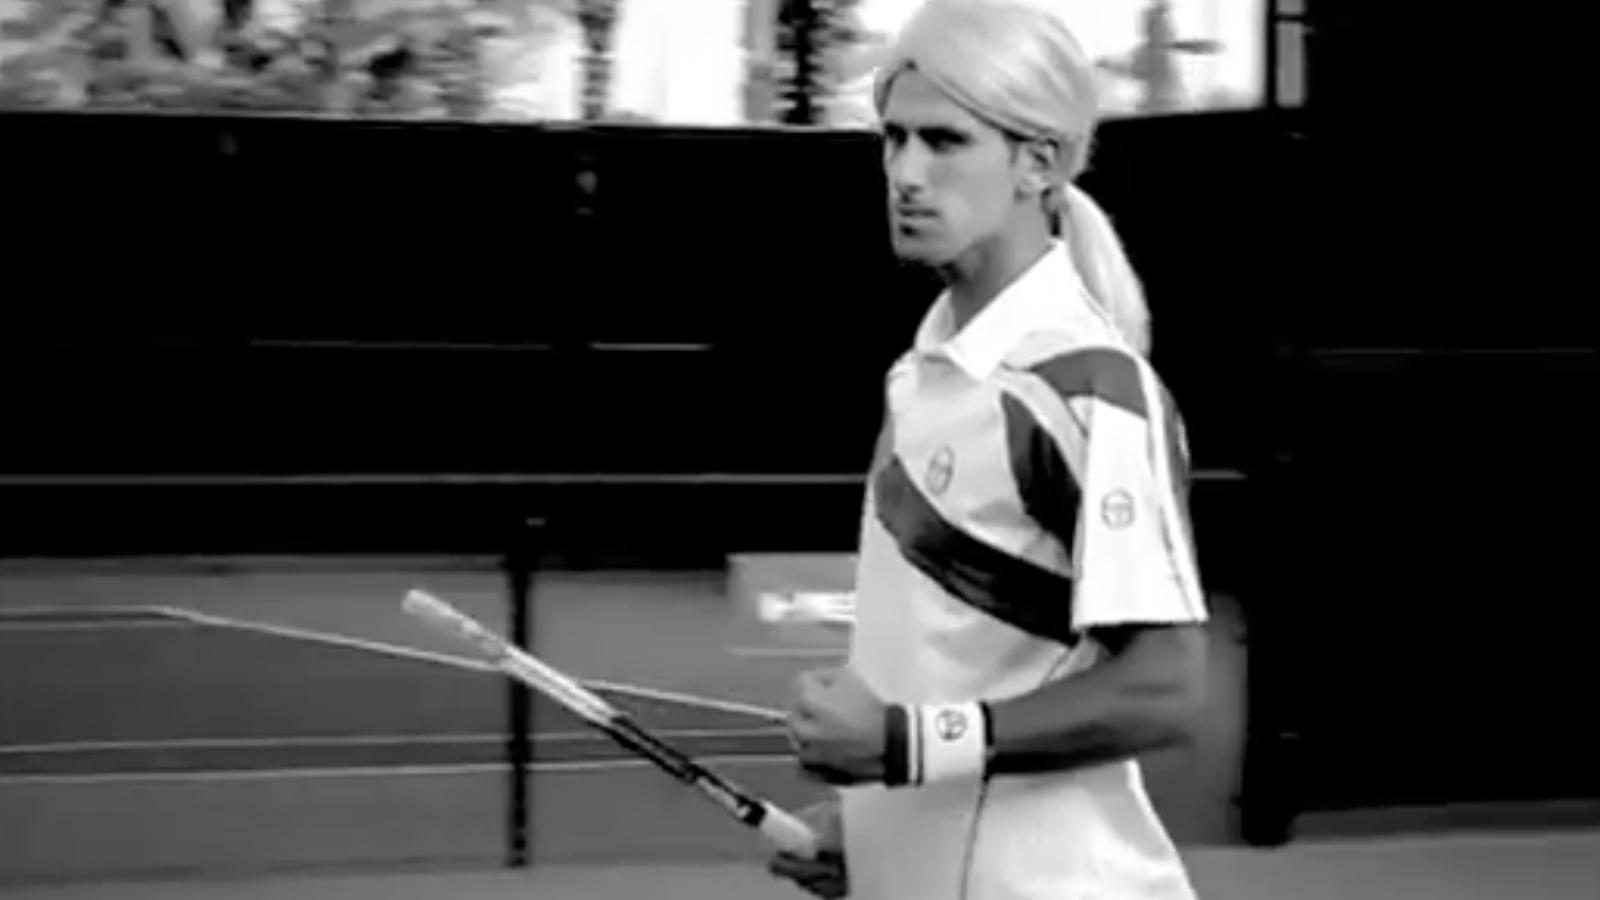 Djokovic imita Xarapova en un anunci de raquetes